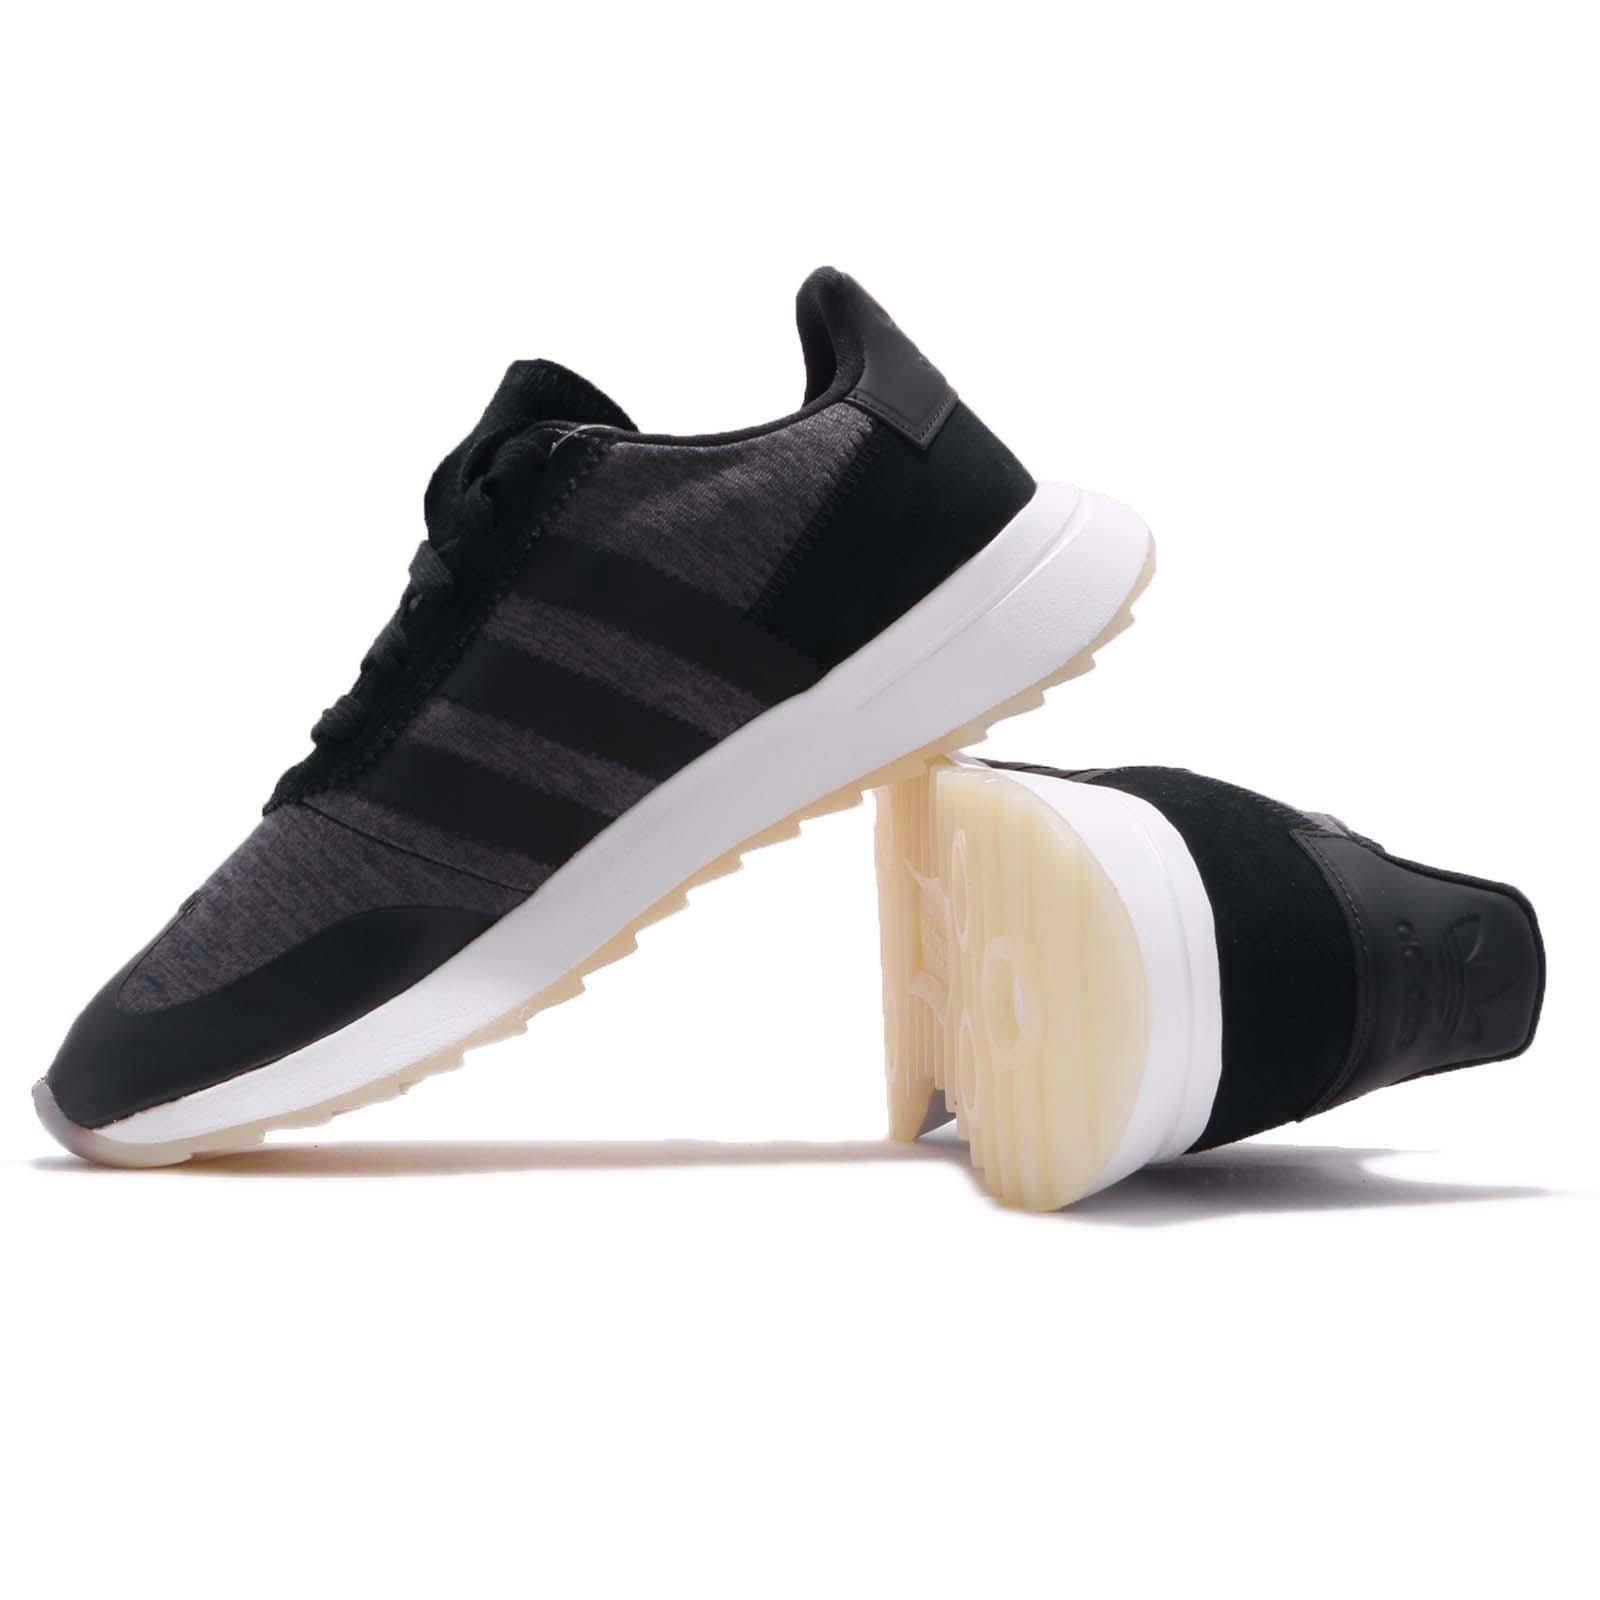 bd400c1c95eb1e adidas Originals FLB Runner W Black White Grey Women Running Shoe ...